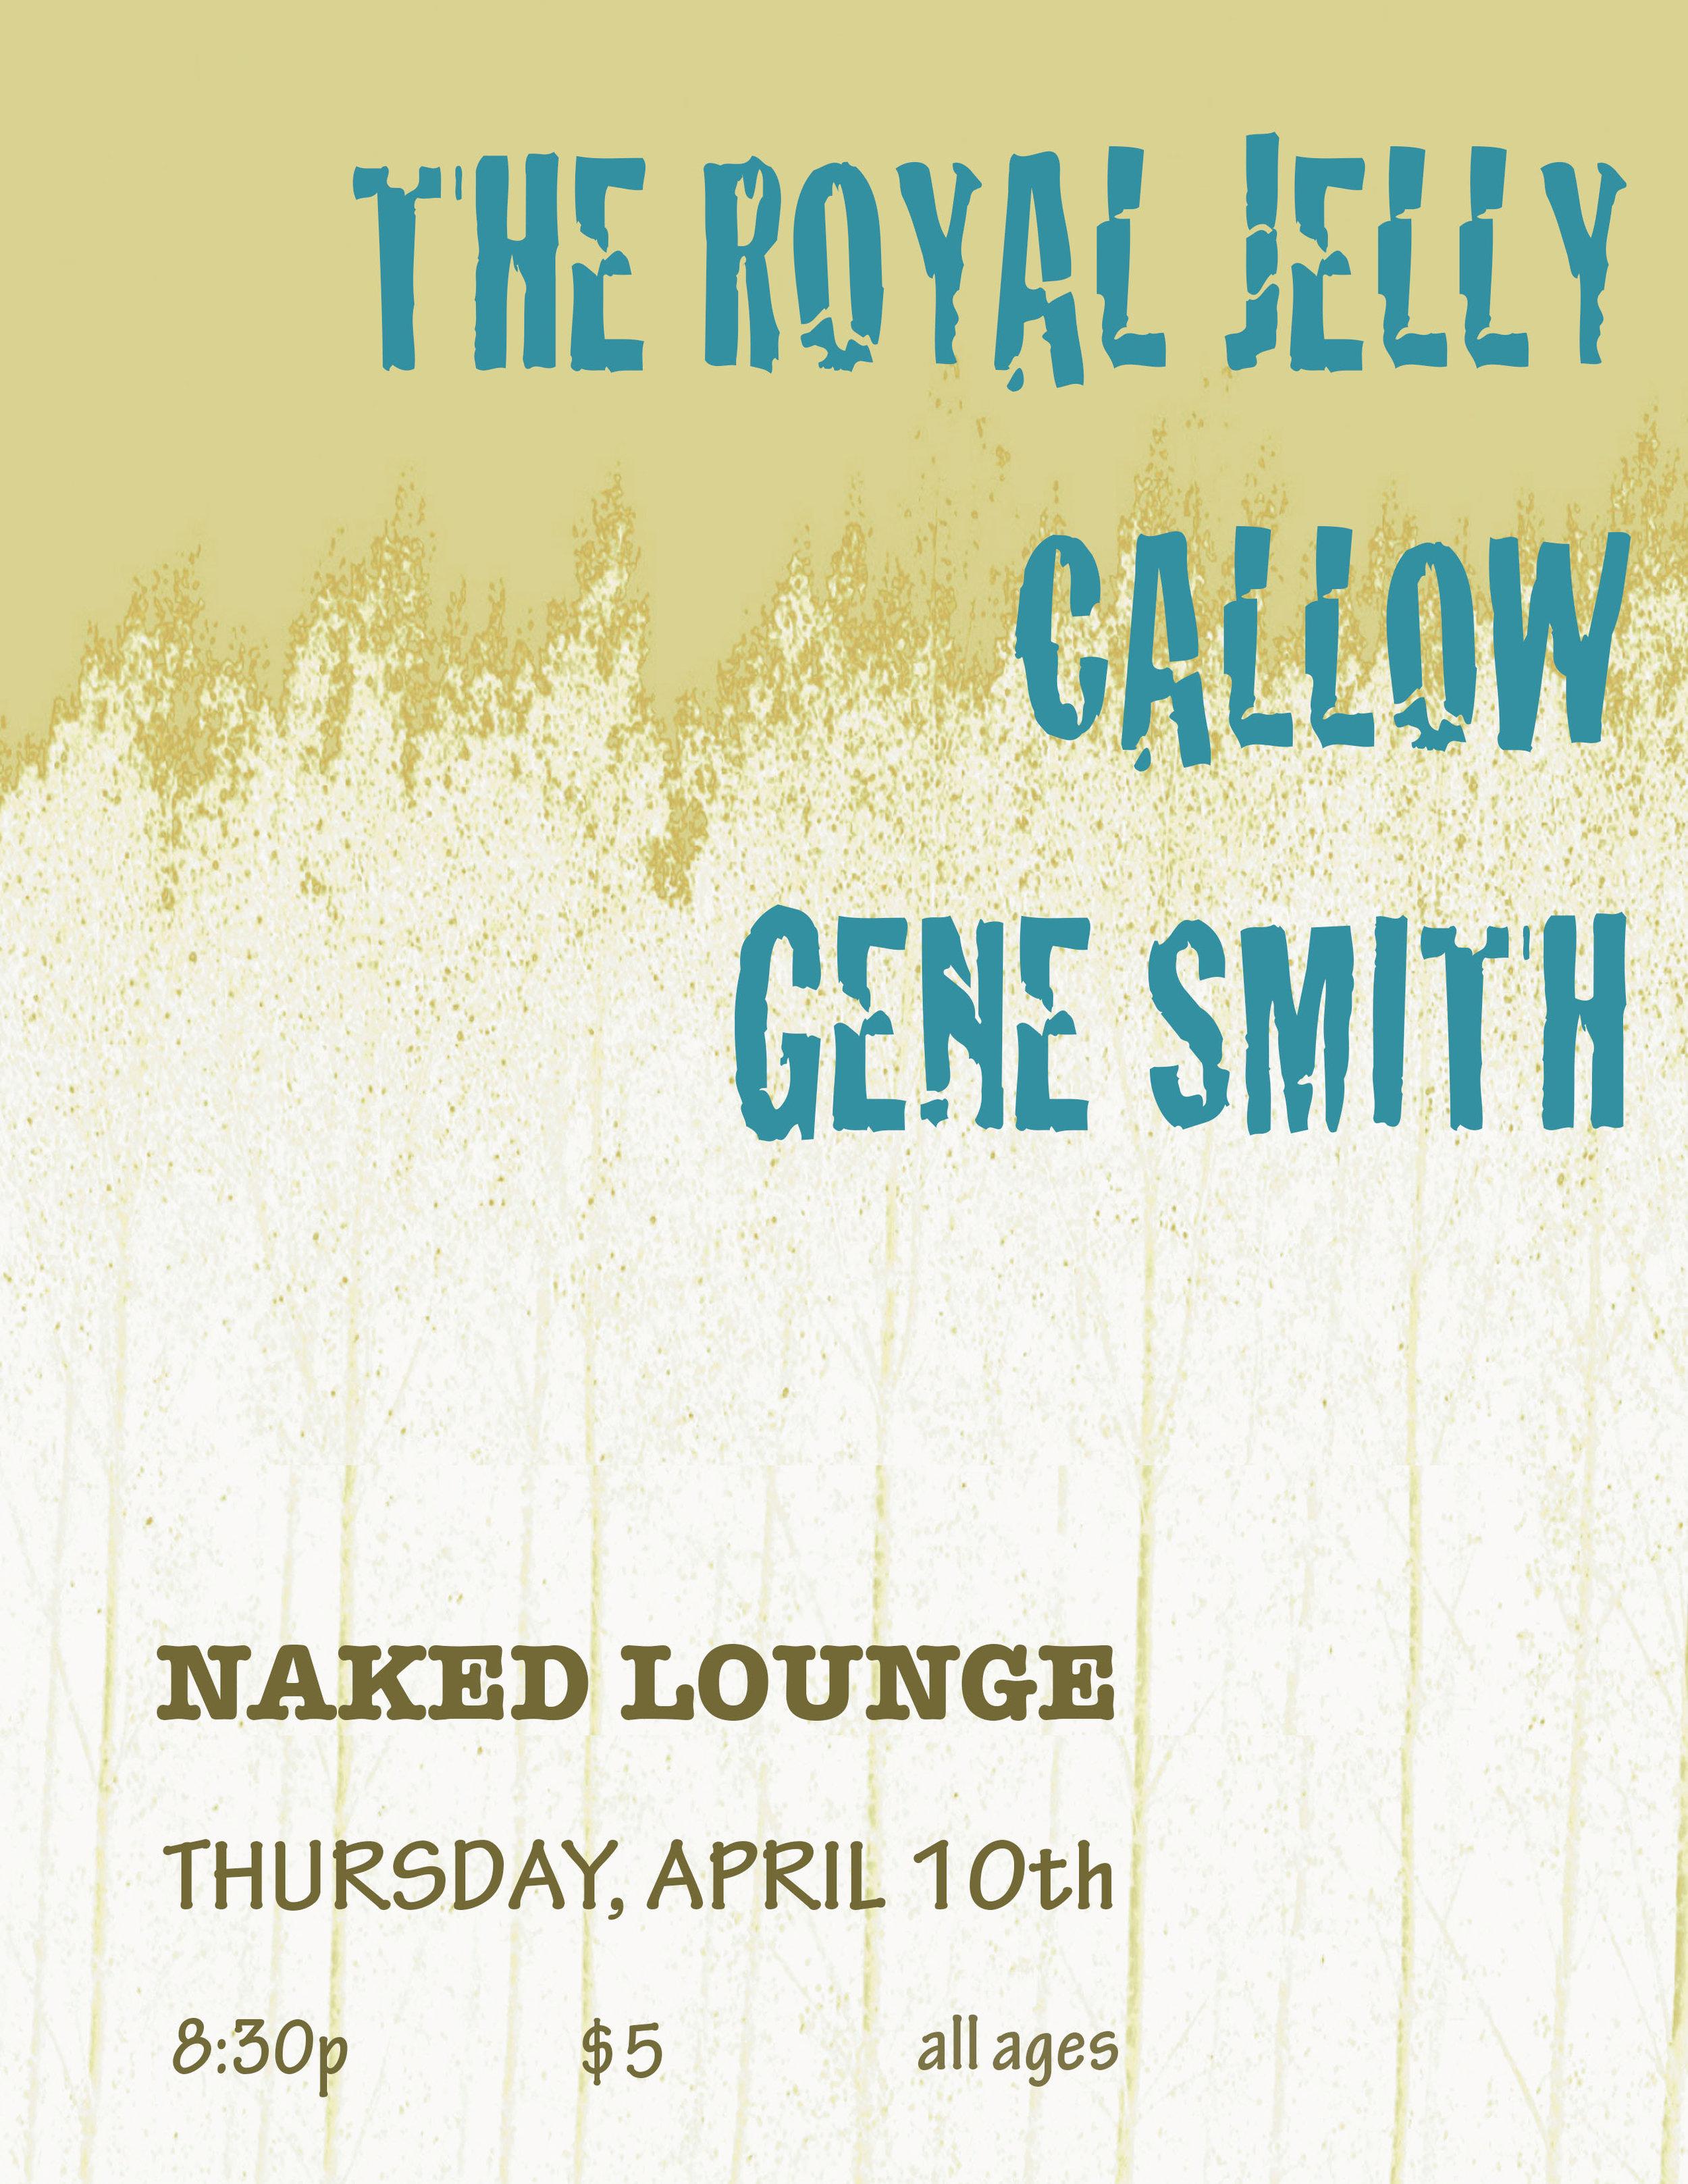 naked lounge poster.jpg